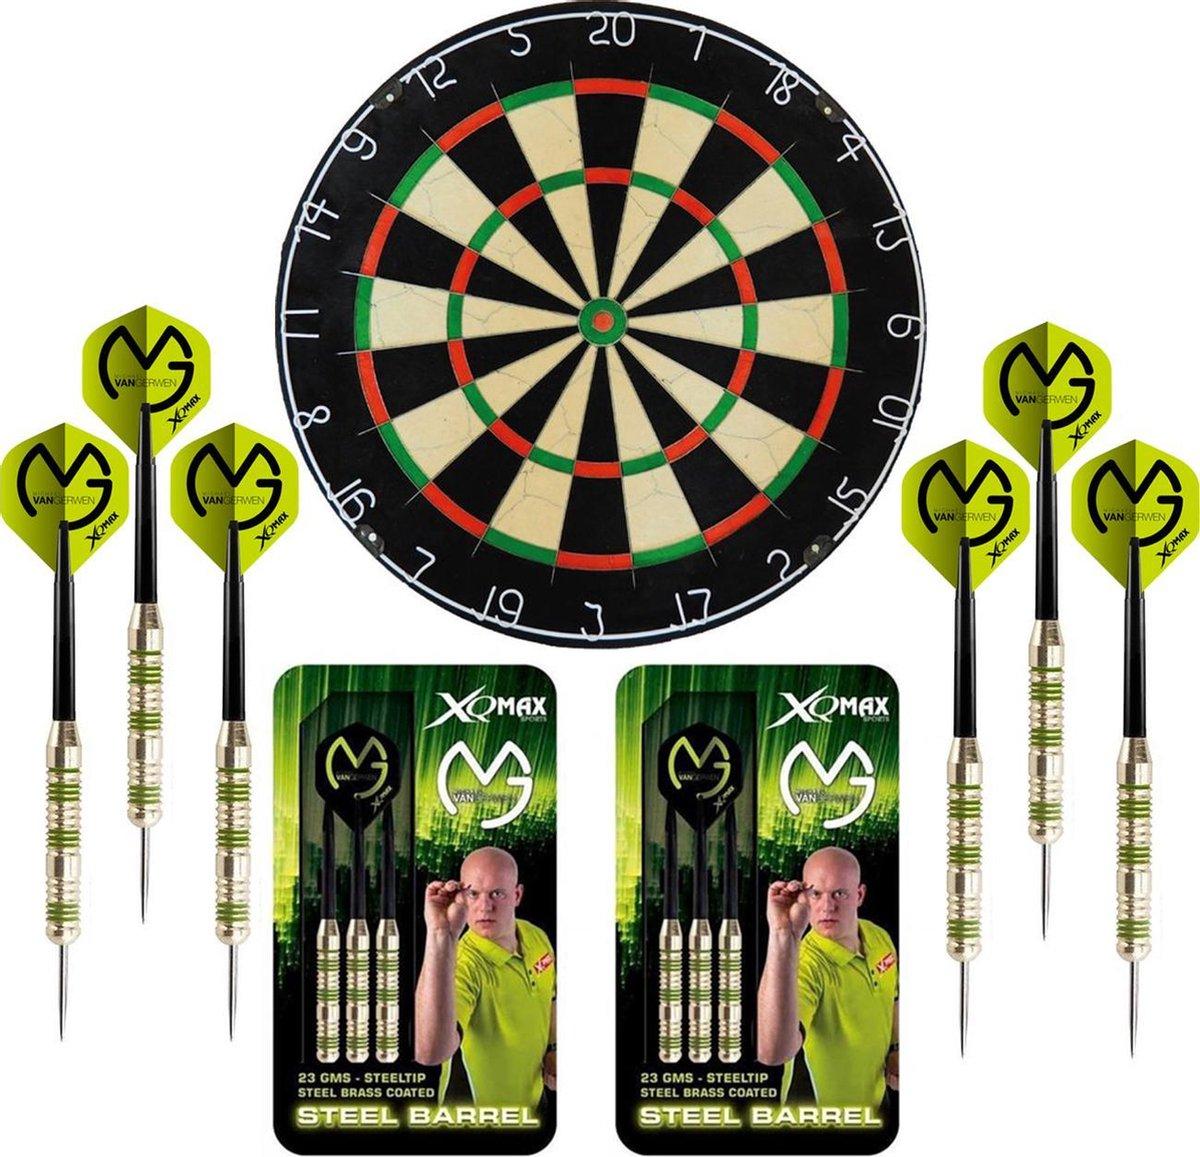 Dragon Darts Michael van Gerwen Octane set - dartbord - 2 sets - dartpijlen - dart shafts - dart flights - Plain A-Merk XQ dartbord